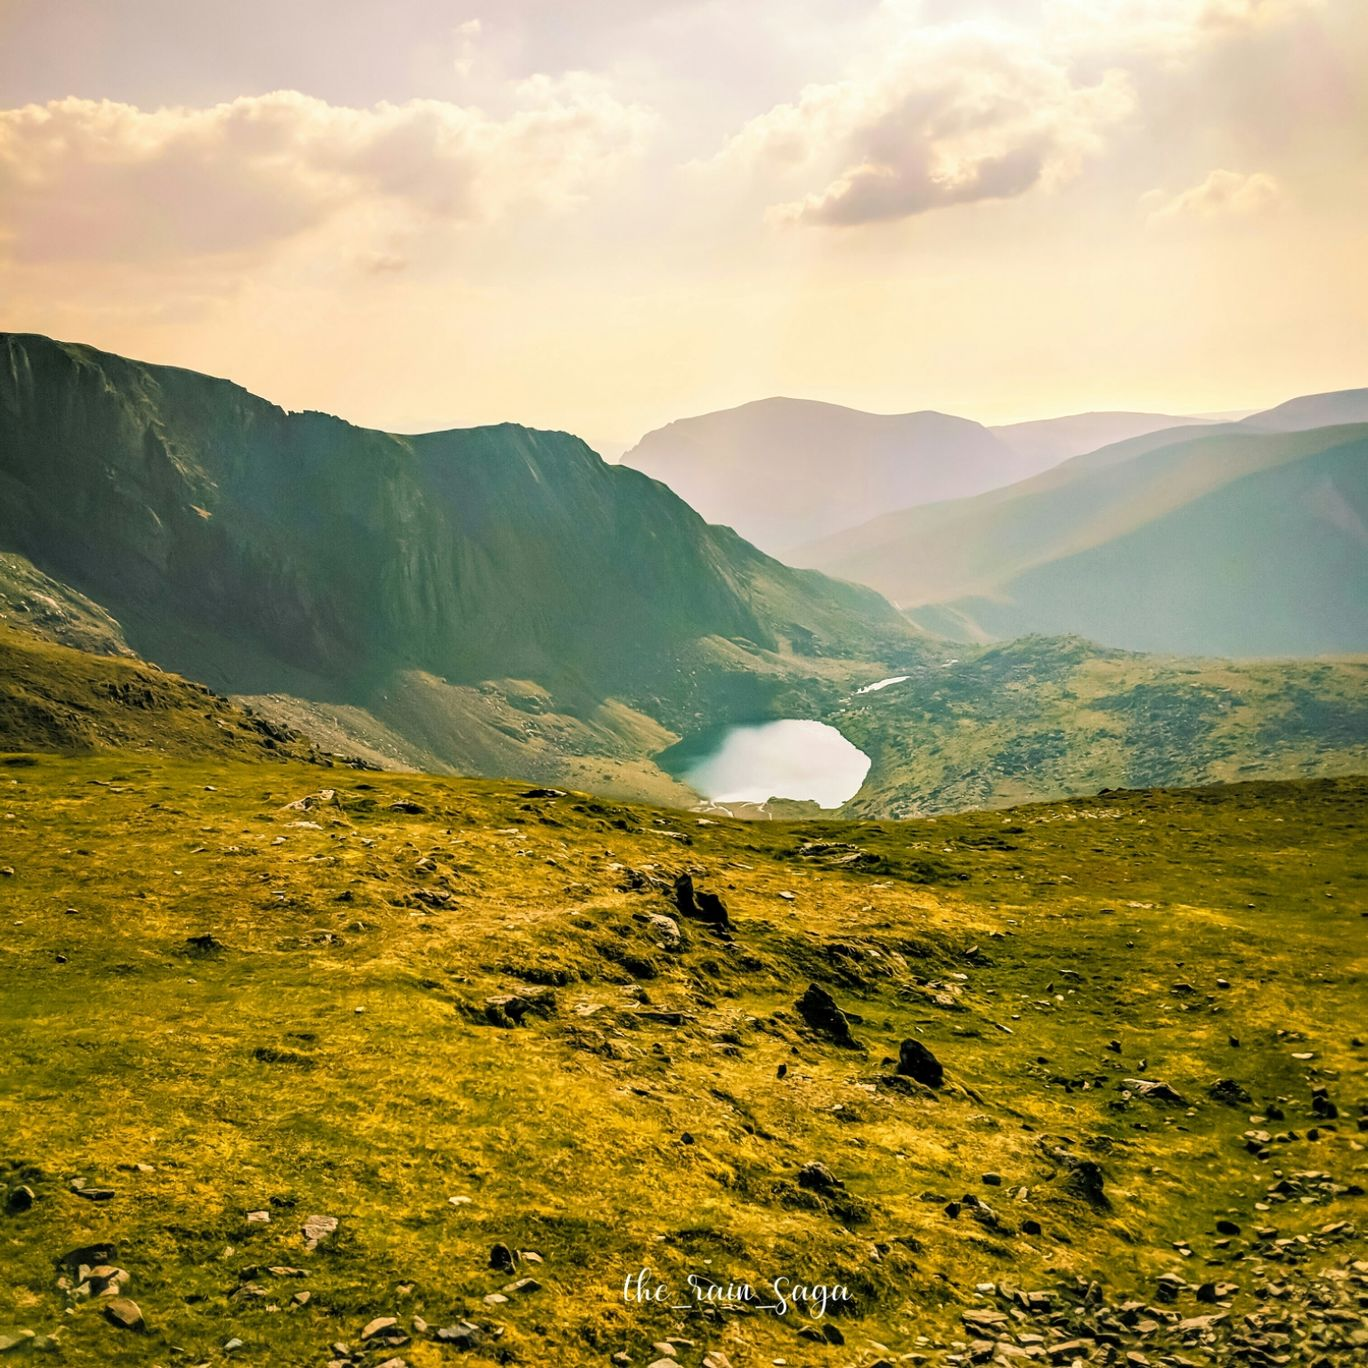 Photo of Snowdonia National Park By Rainy Baruah Kalita